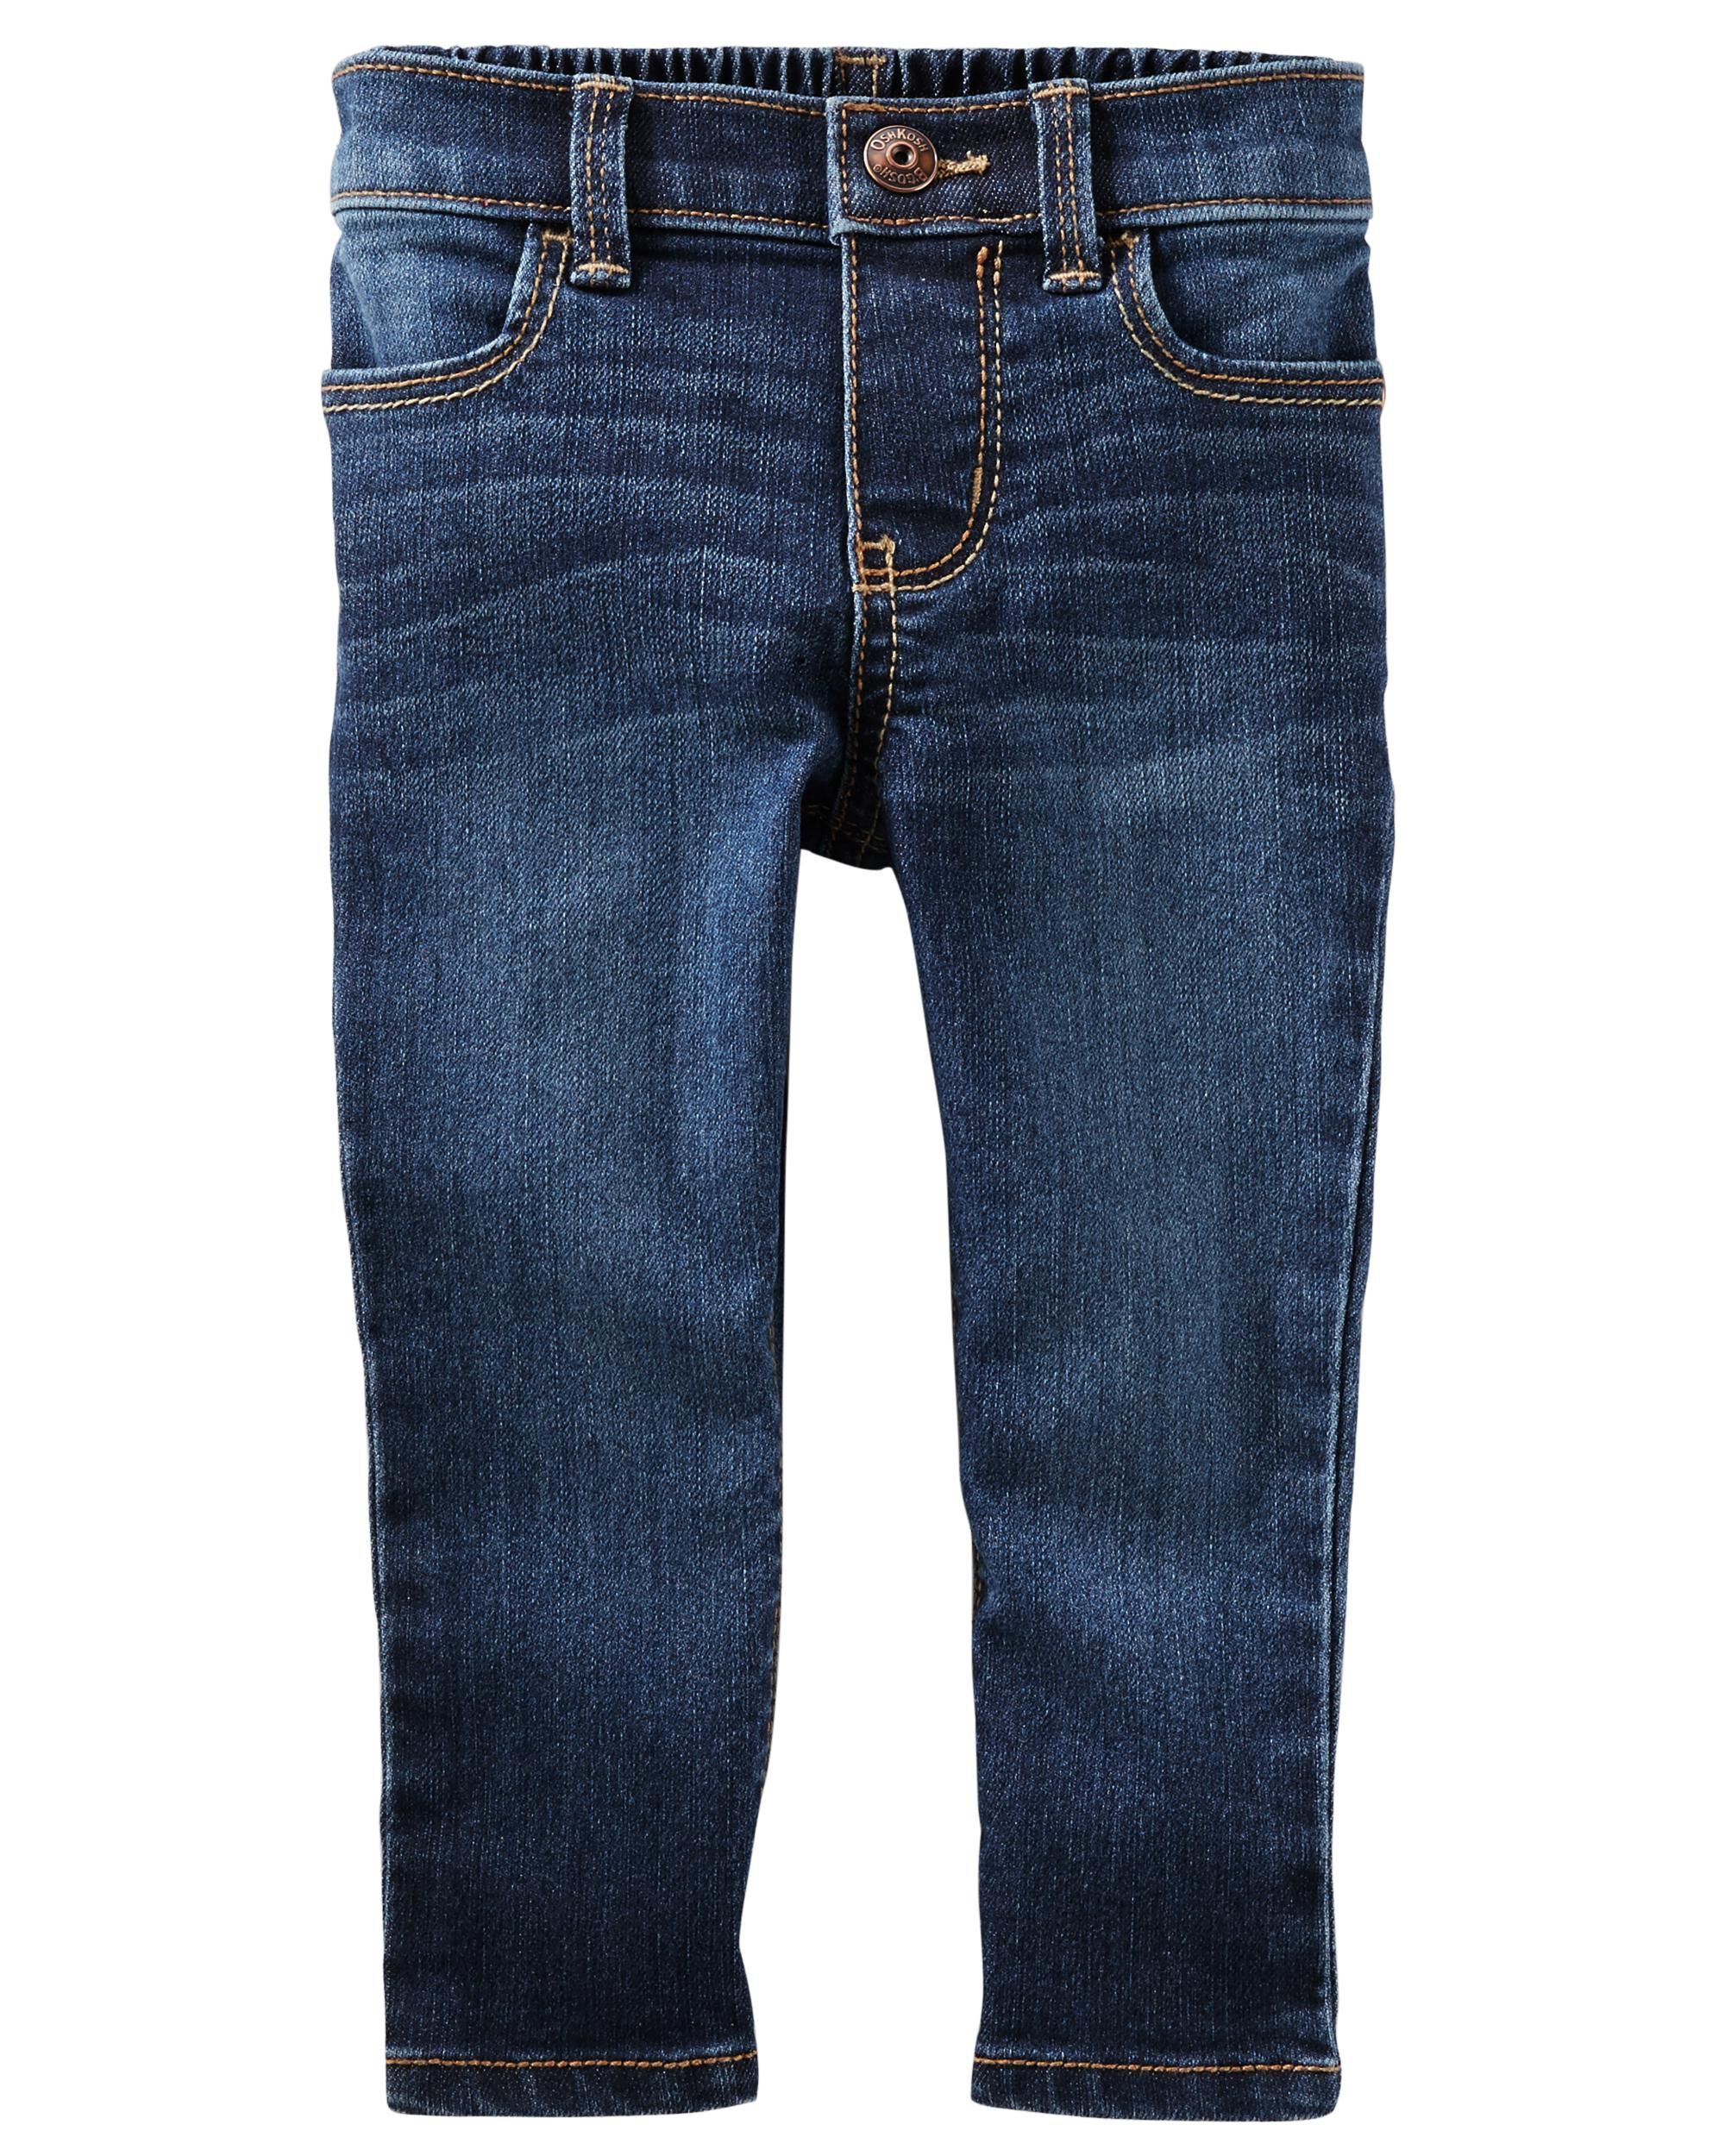 Carters Super Skinny Jeans - Marine Blue Wash